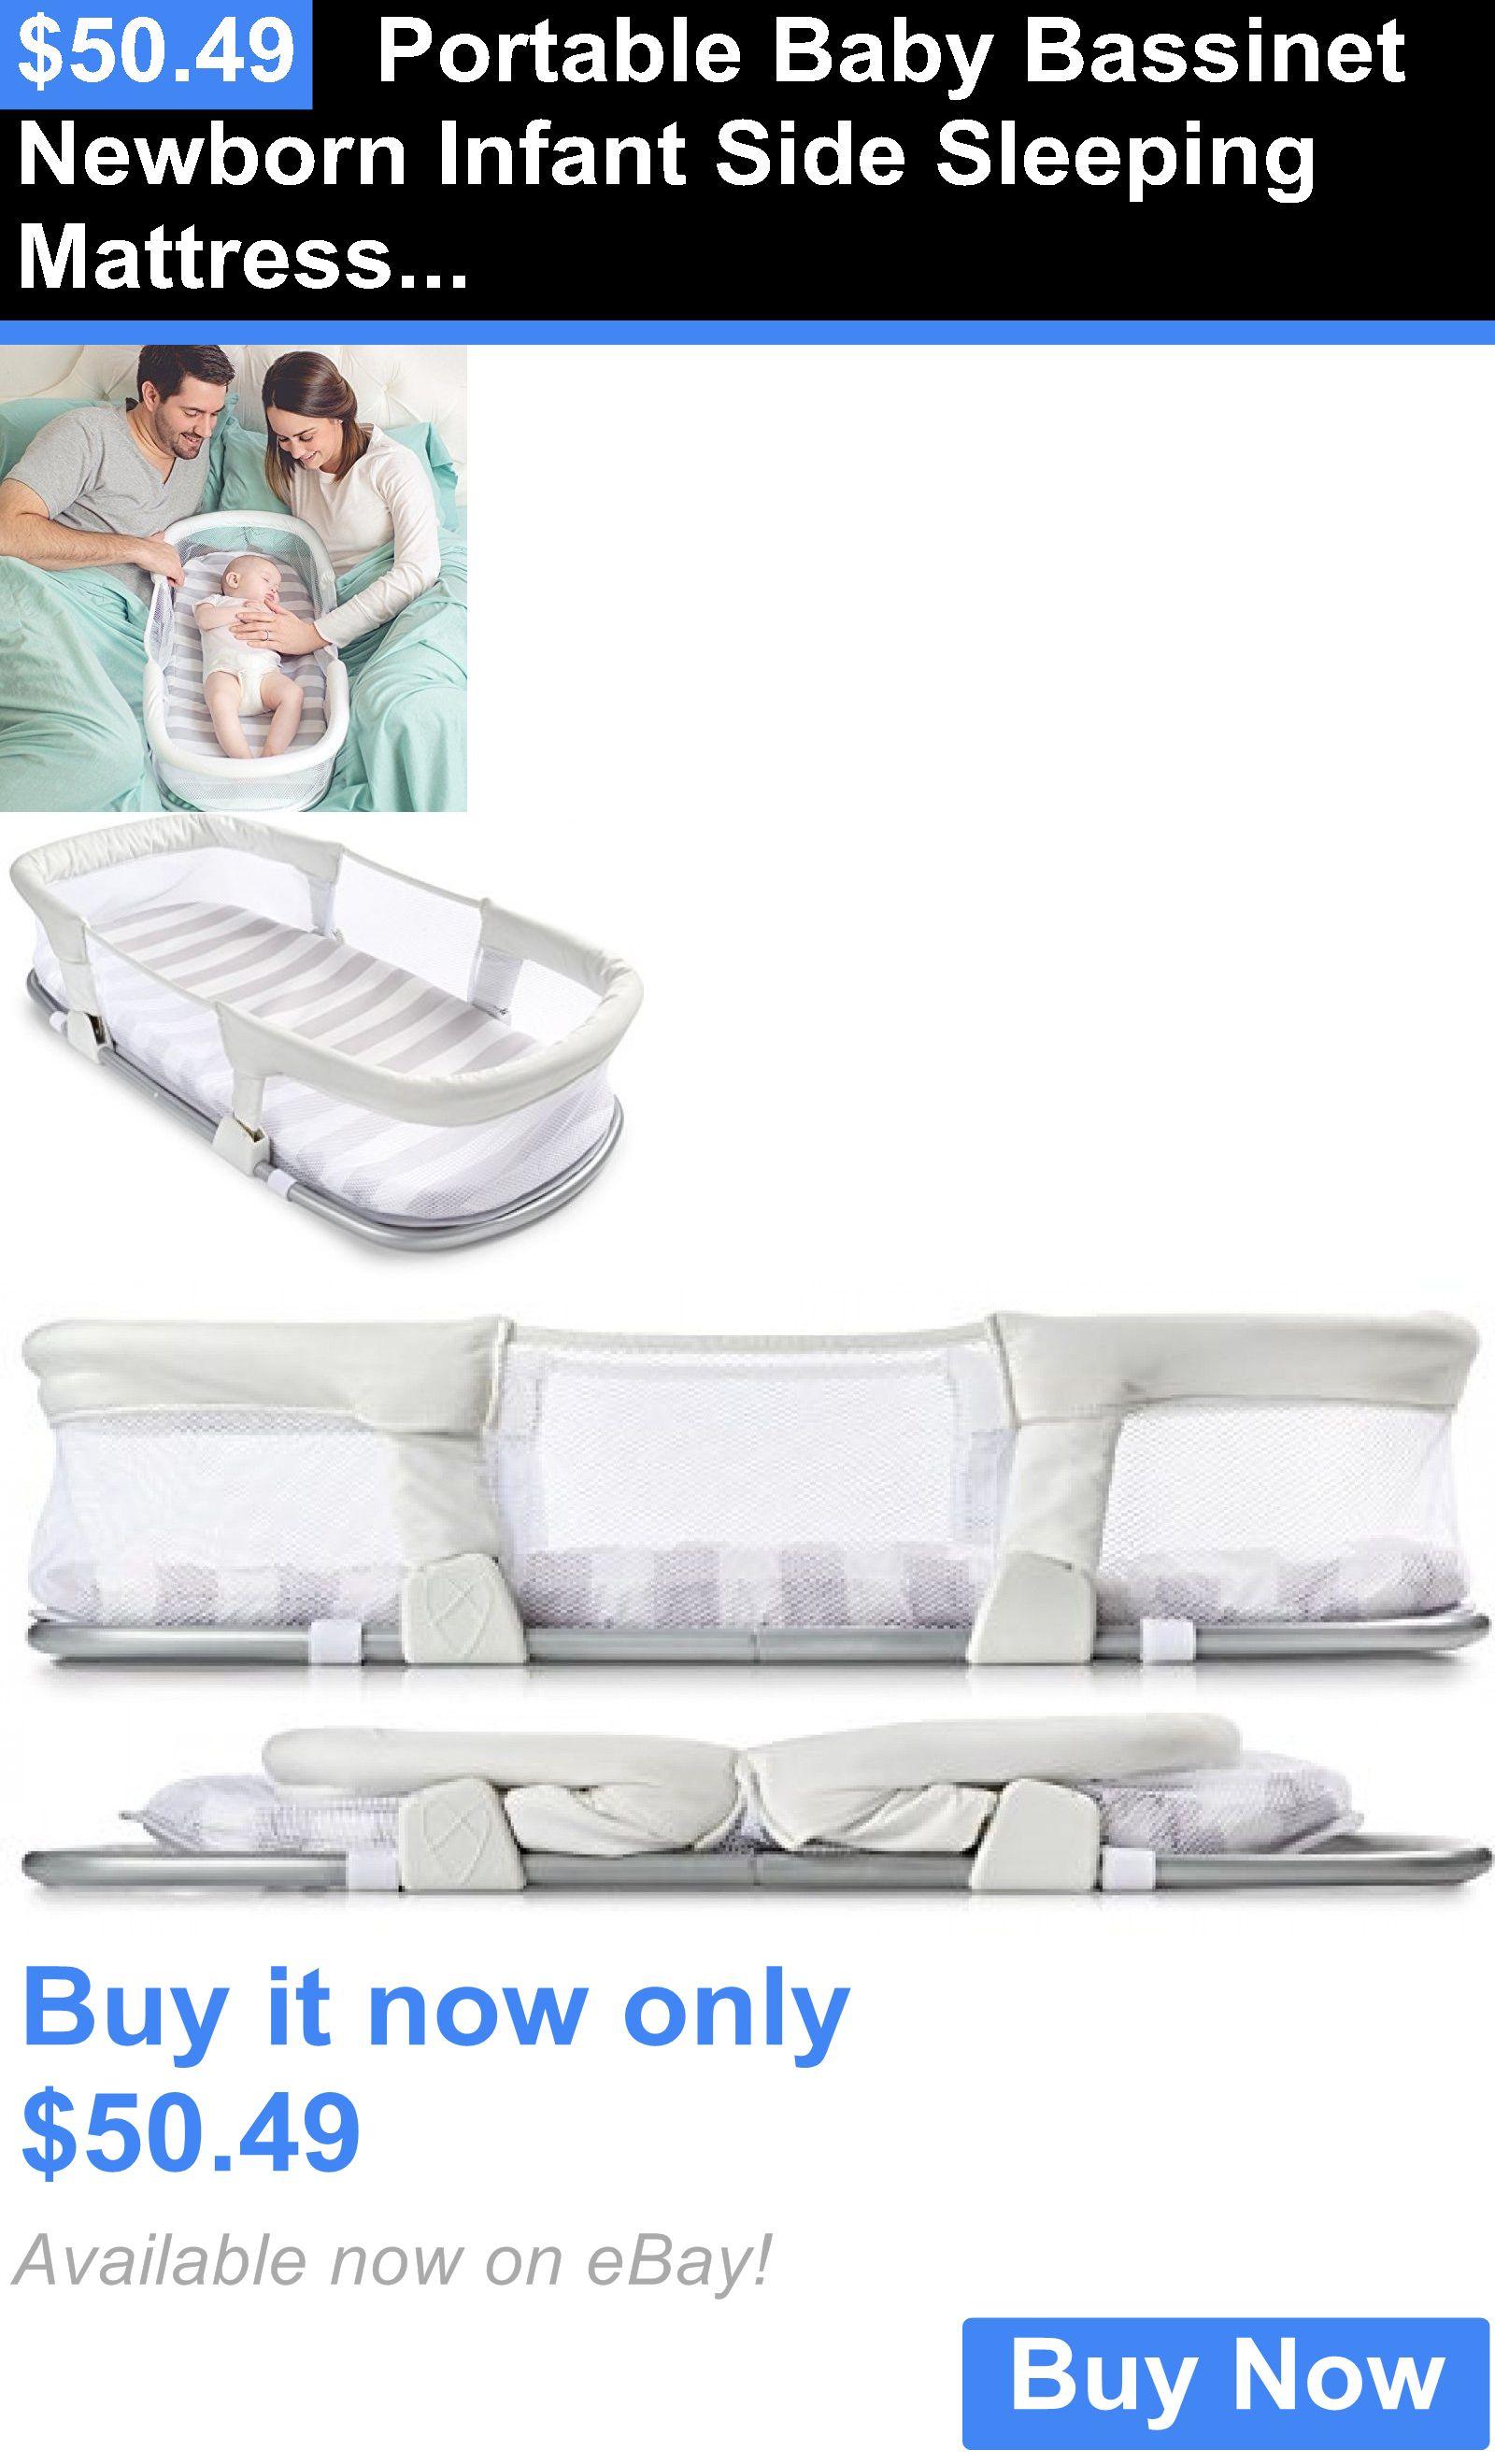 Baby Nursery Portable Baby Bassinet Newborn Infant Side Sleeping